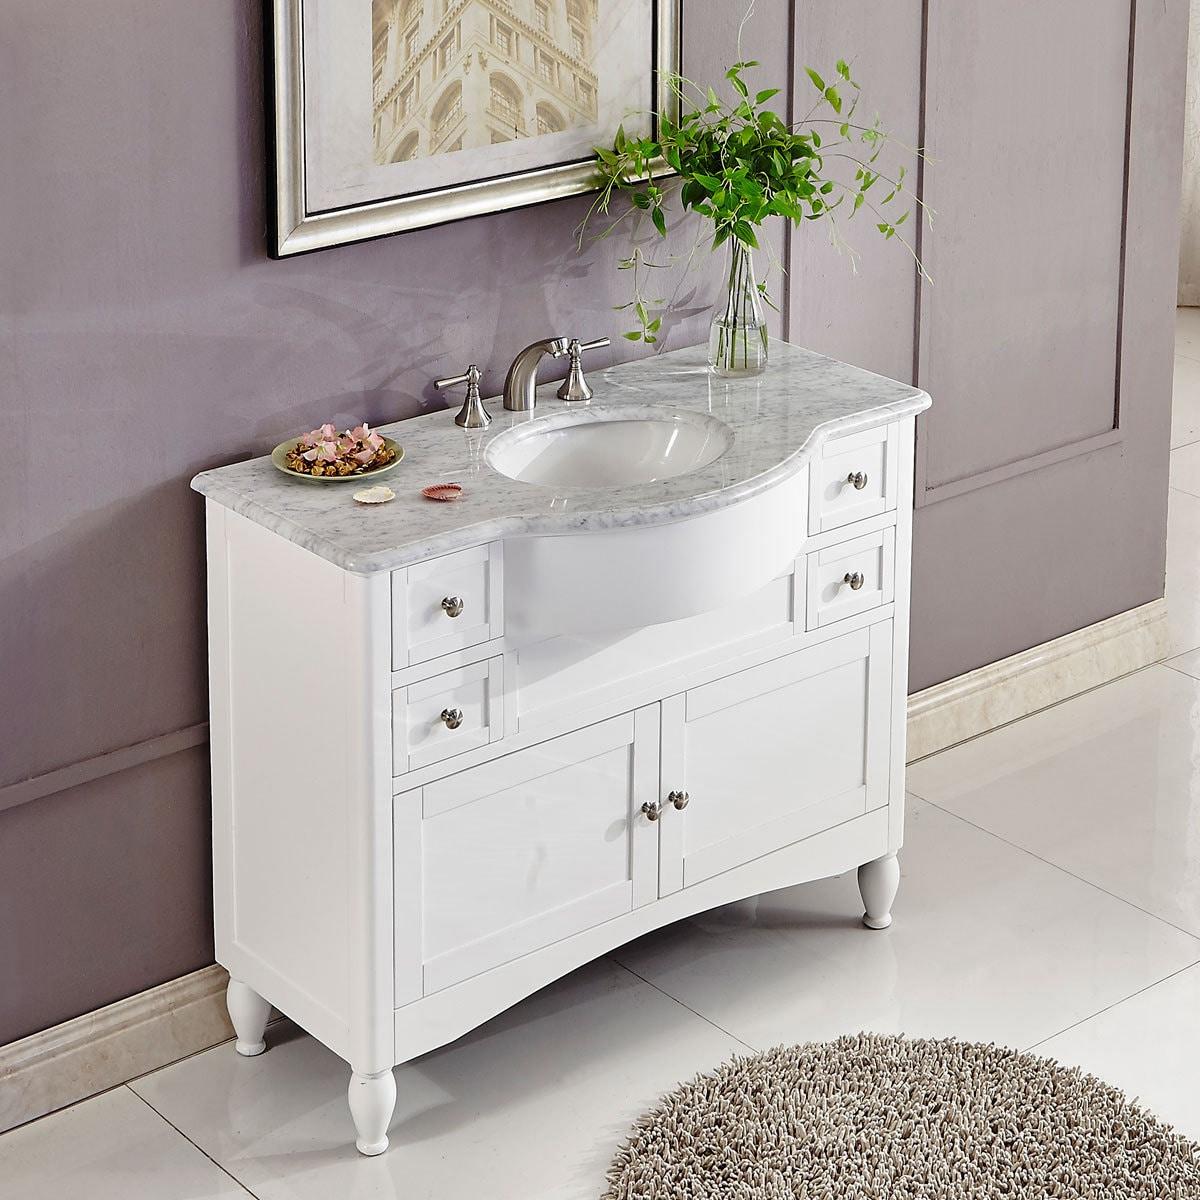 Silkroad Exclusive 45 Inch Contemporary Bathroom Vanity Single Sink Cabinet Overstock 14443147